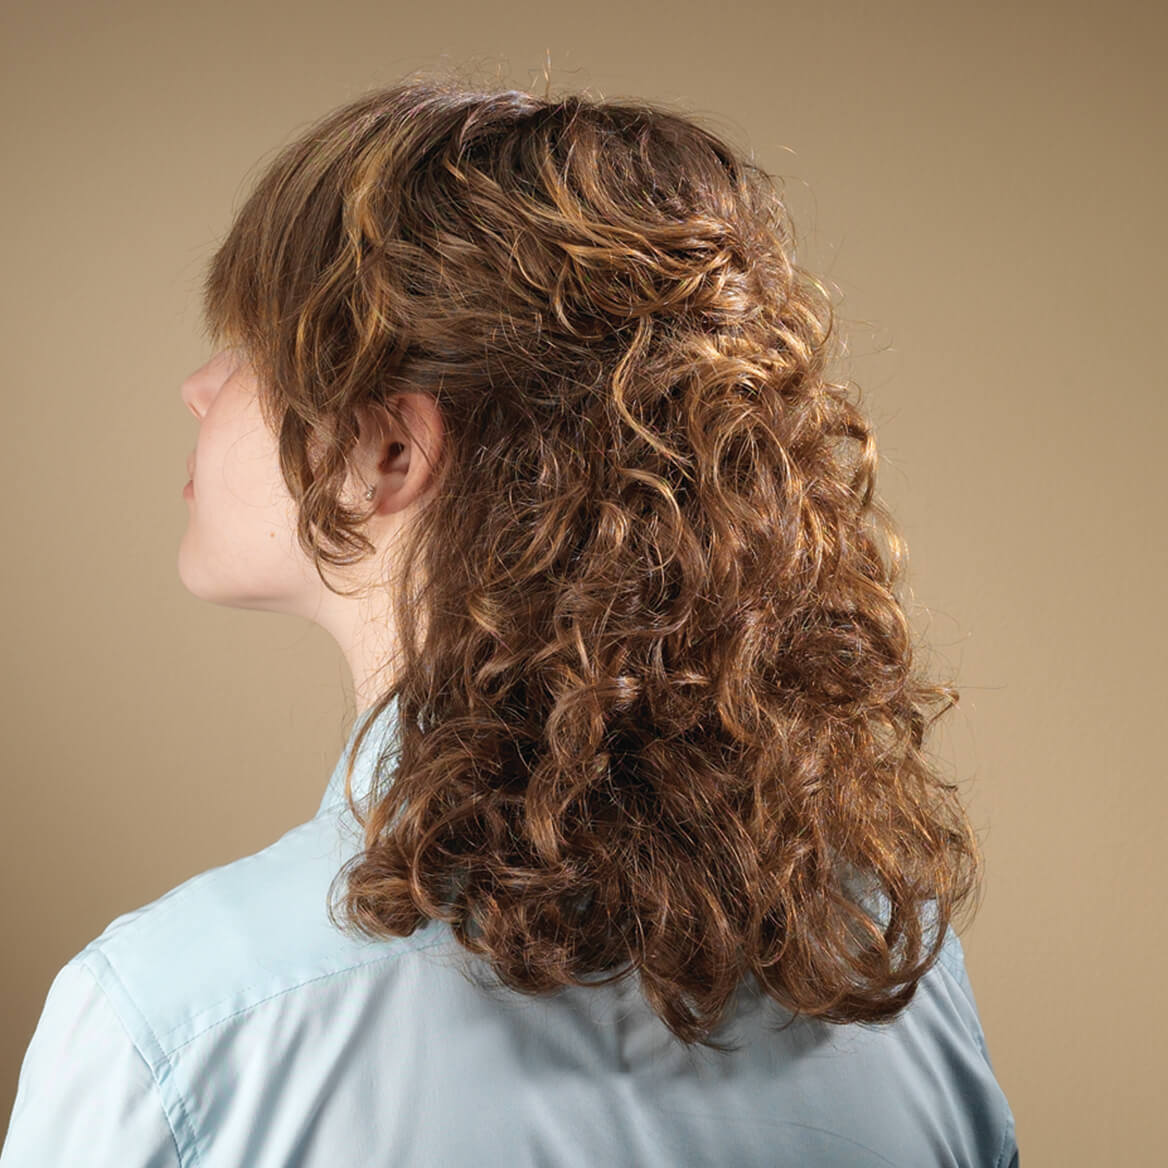 Hair Spools - Set Of 24-331356